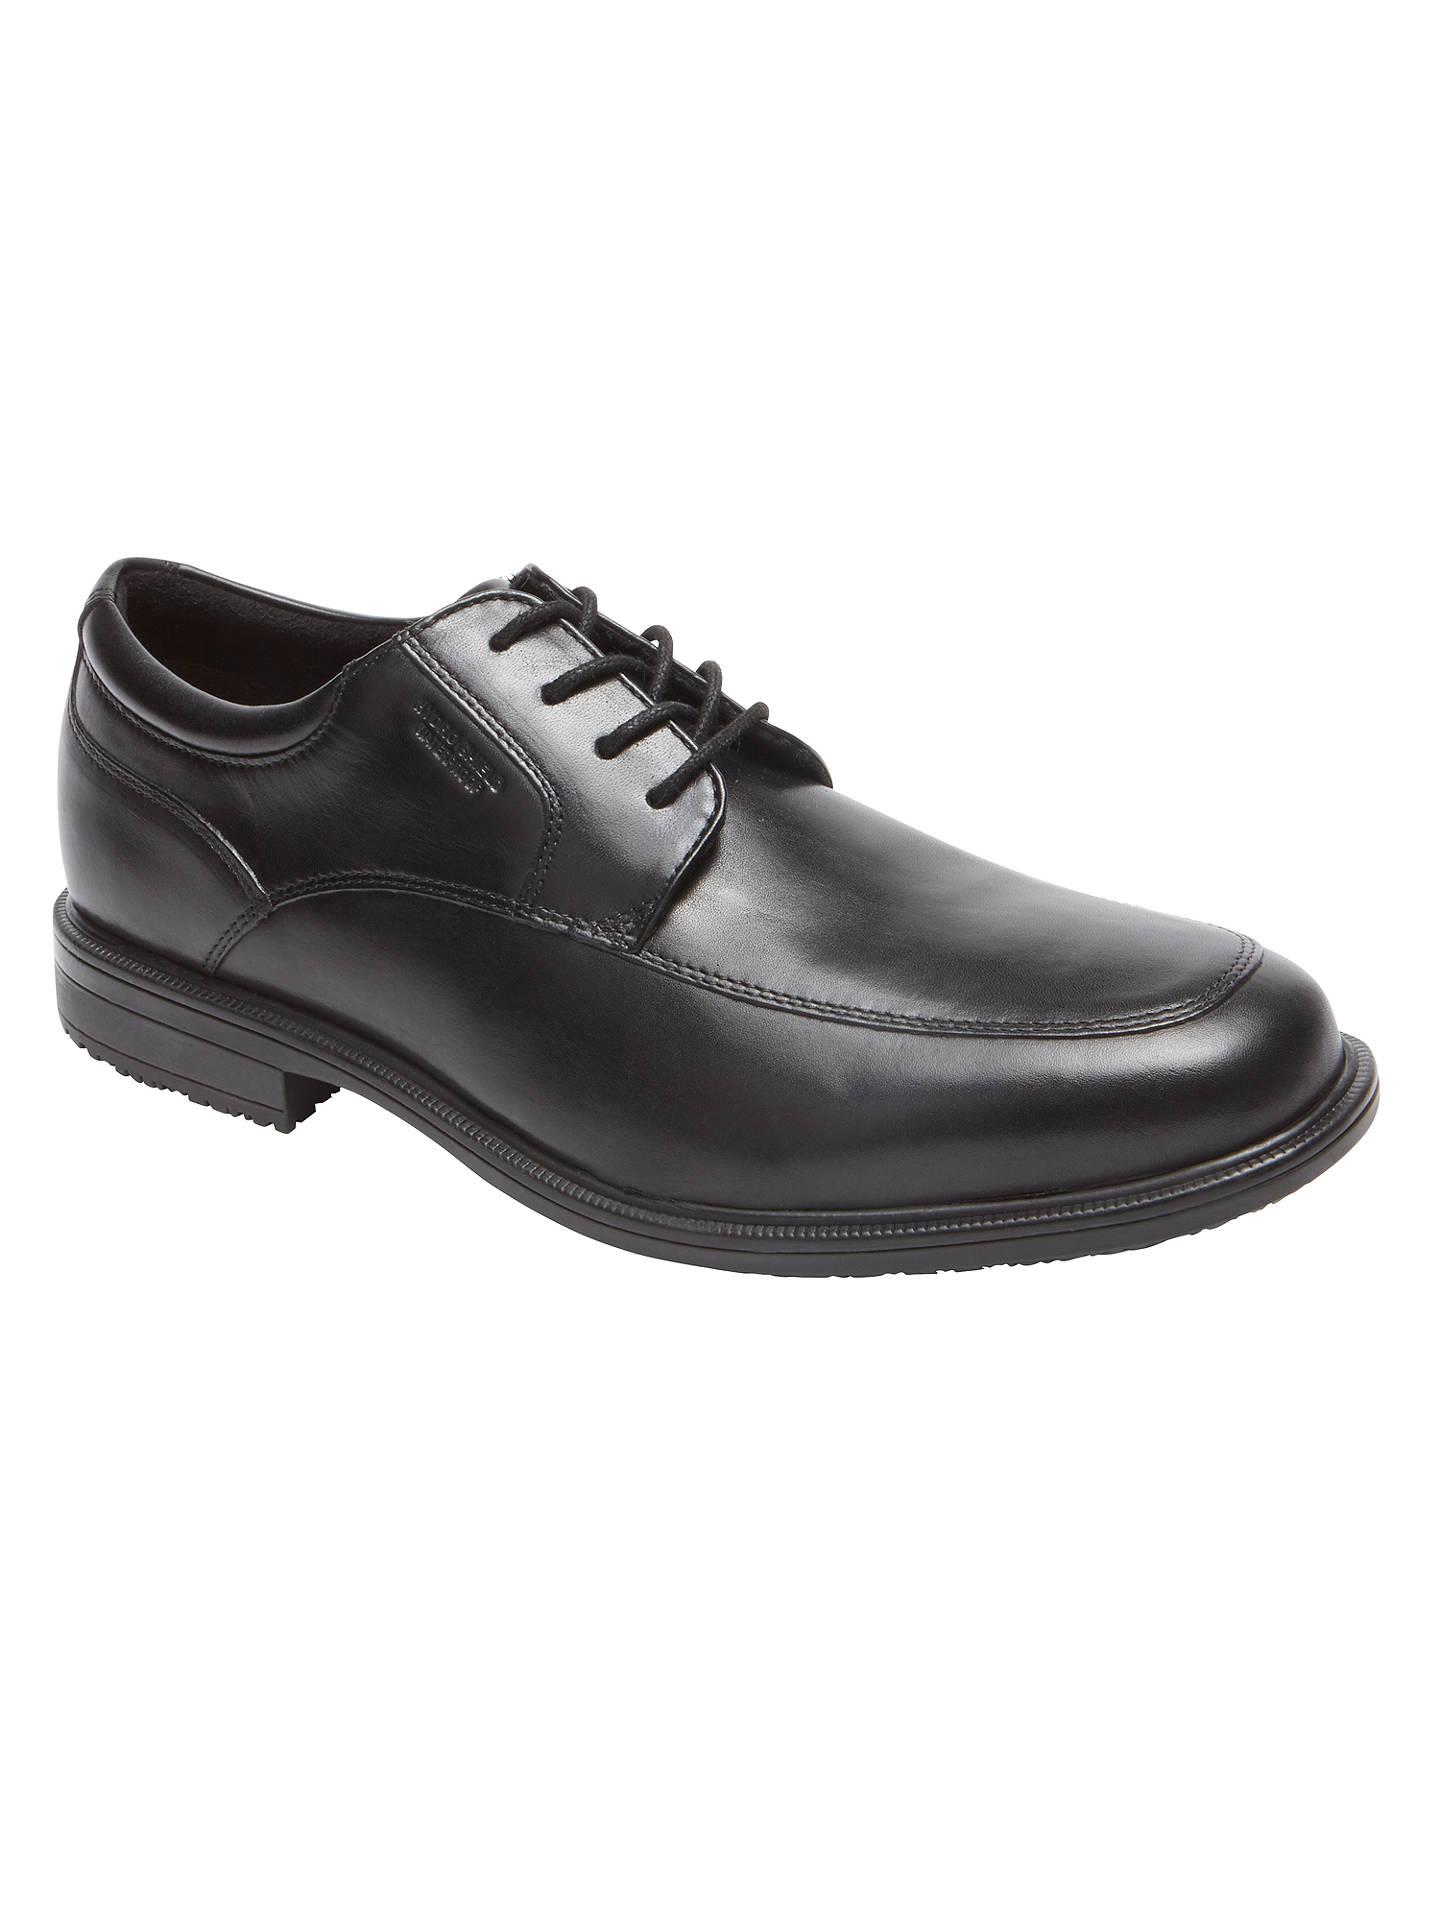 08e0c8decf43 Buy Rockport Essential Details 2 Waterproof Apron Toe Leather Derby Shoes